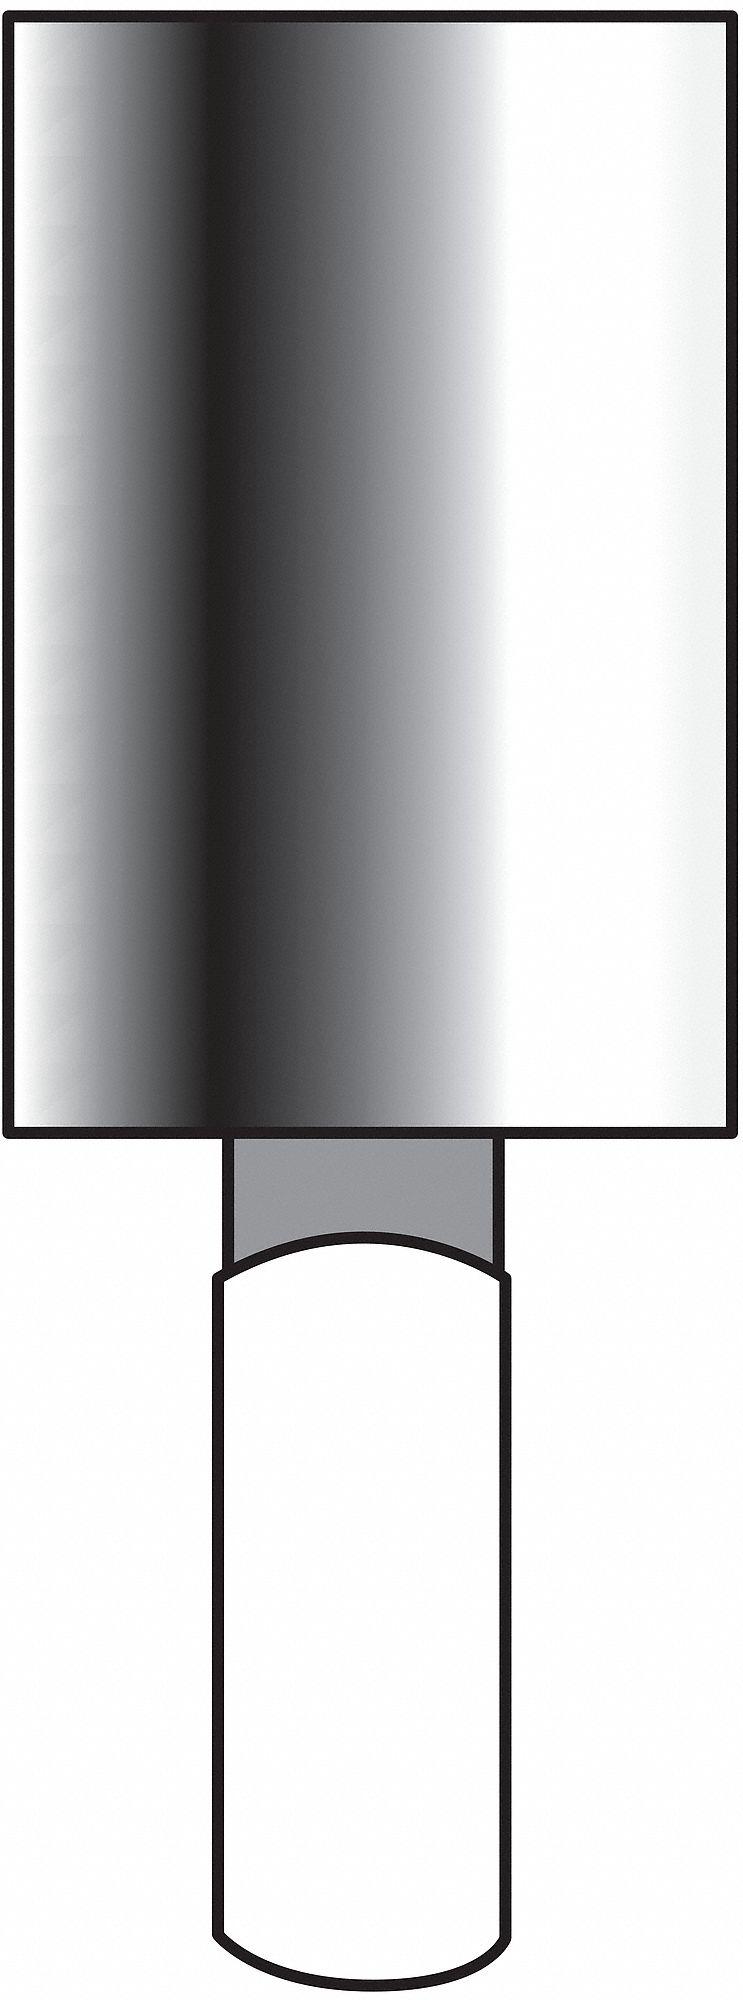 "Norton Medium Vitrified Mounted Point (1/8"" Spindle Diameter). Model: 61463624488"